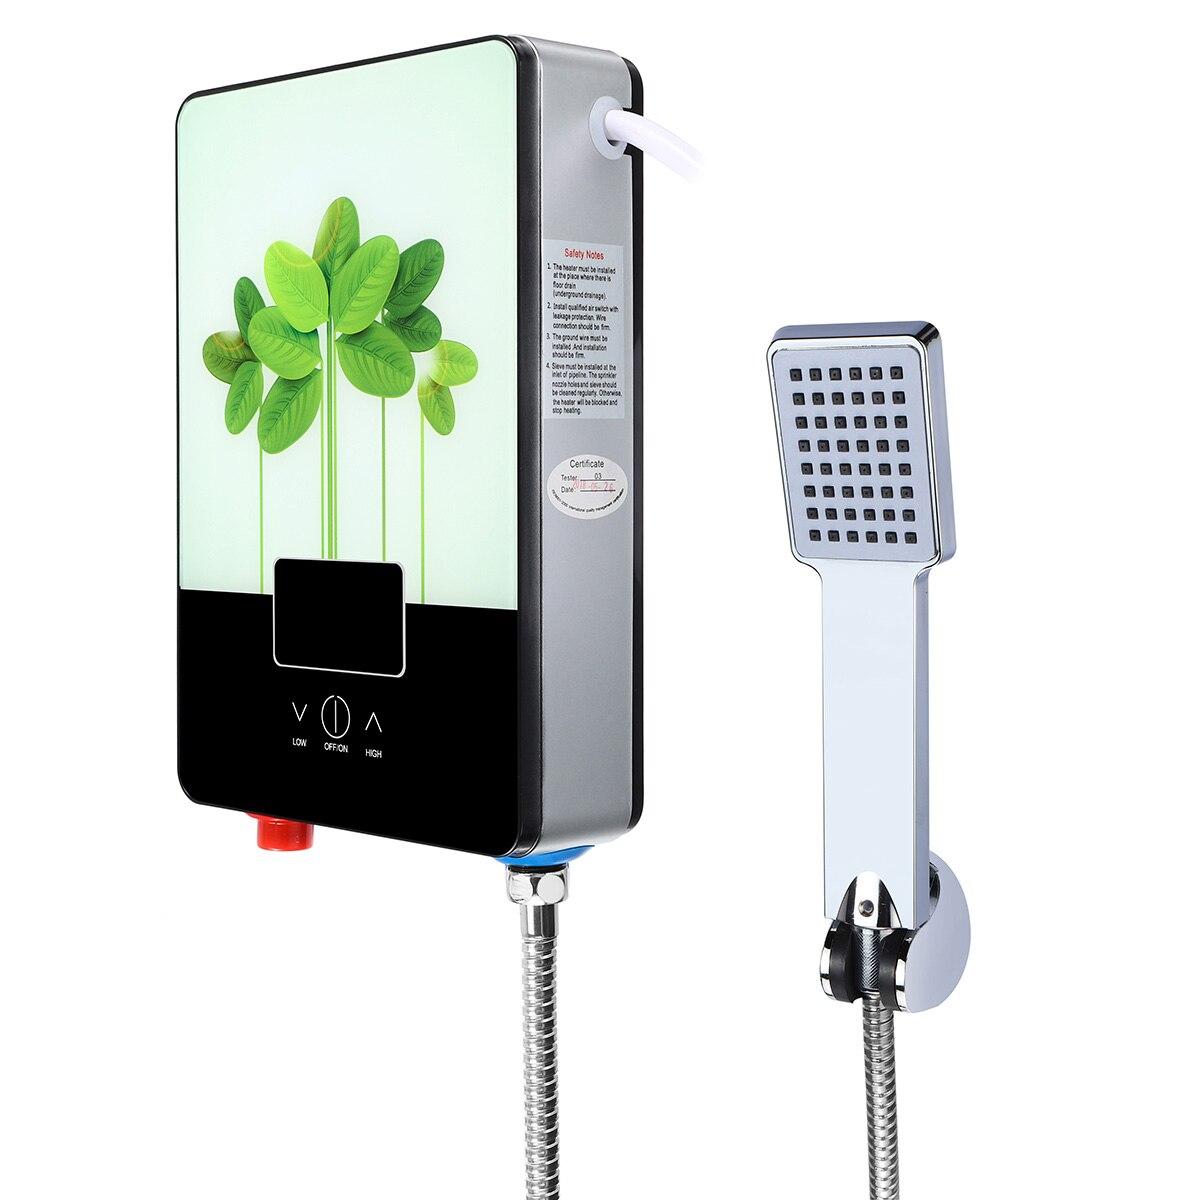 6500W Electric Hot Water Heater Tankless Shower+Shower Head+Hose Kit 220V Tankless Instant Boiler Kitchen Bathroom Shower Set